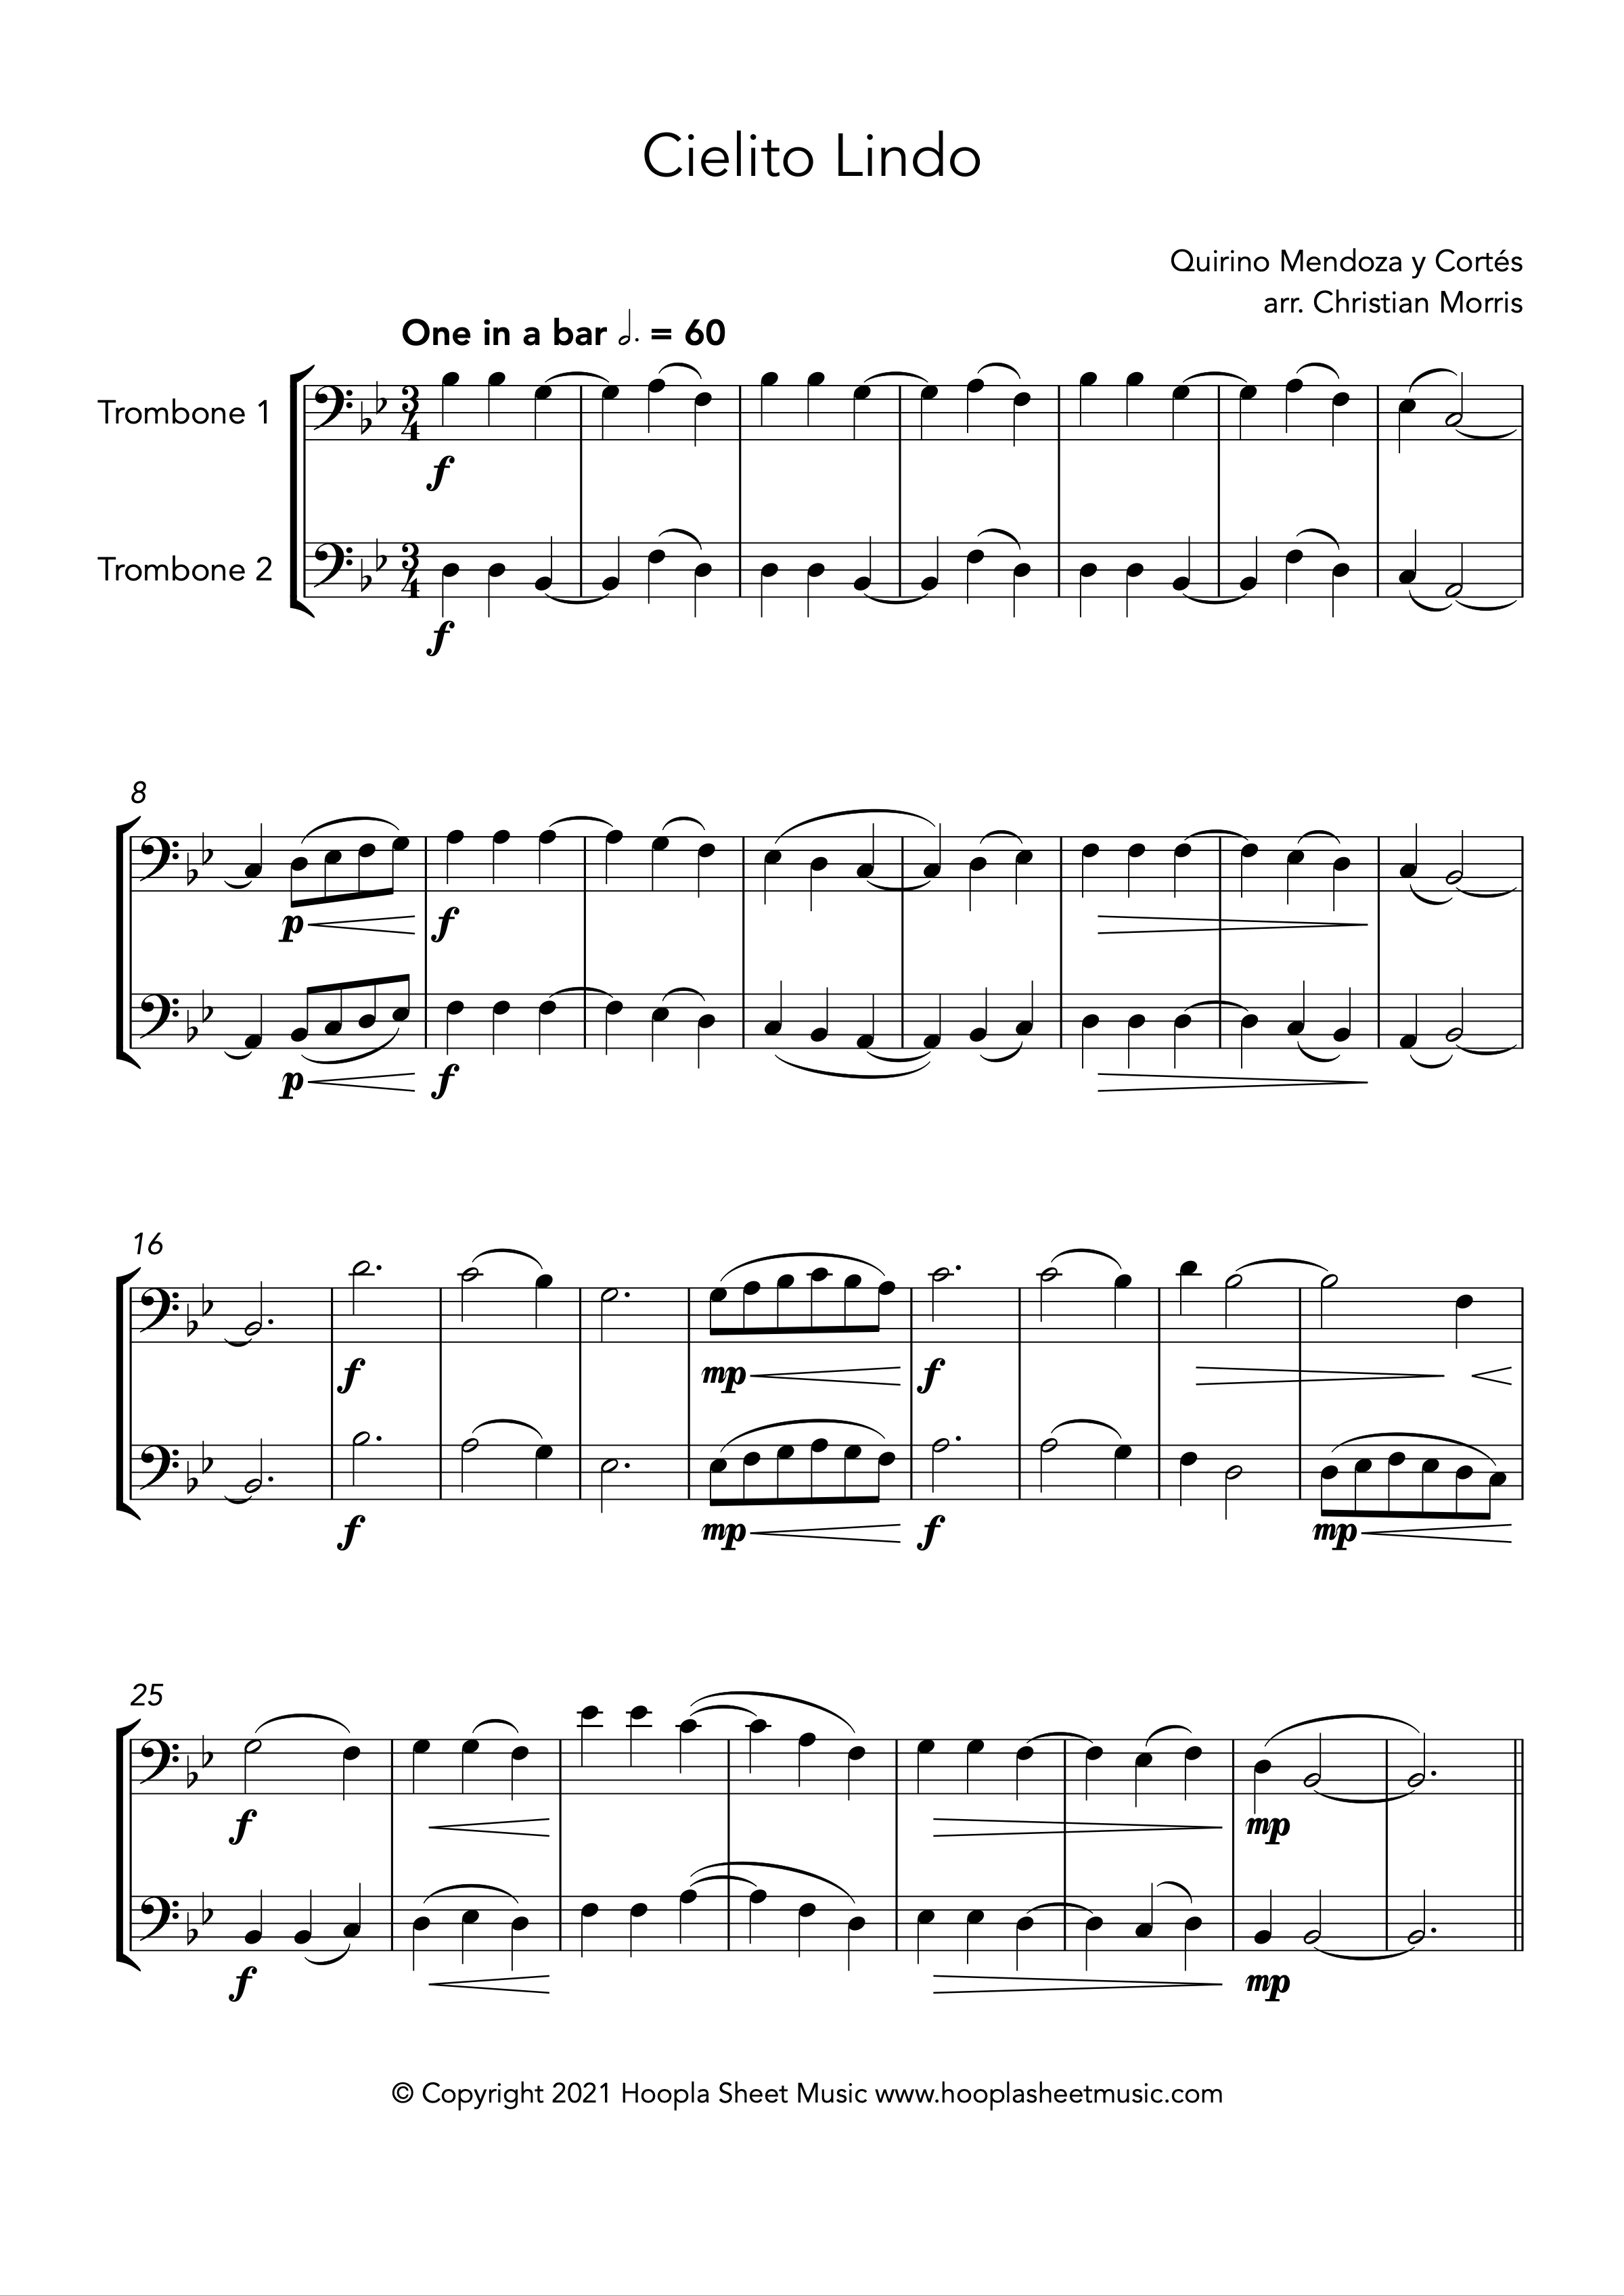 Cielito Lindo (Trombone Duet)